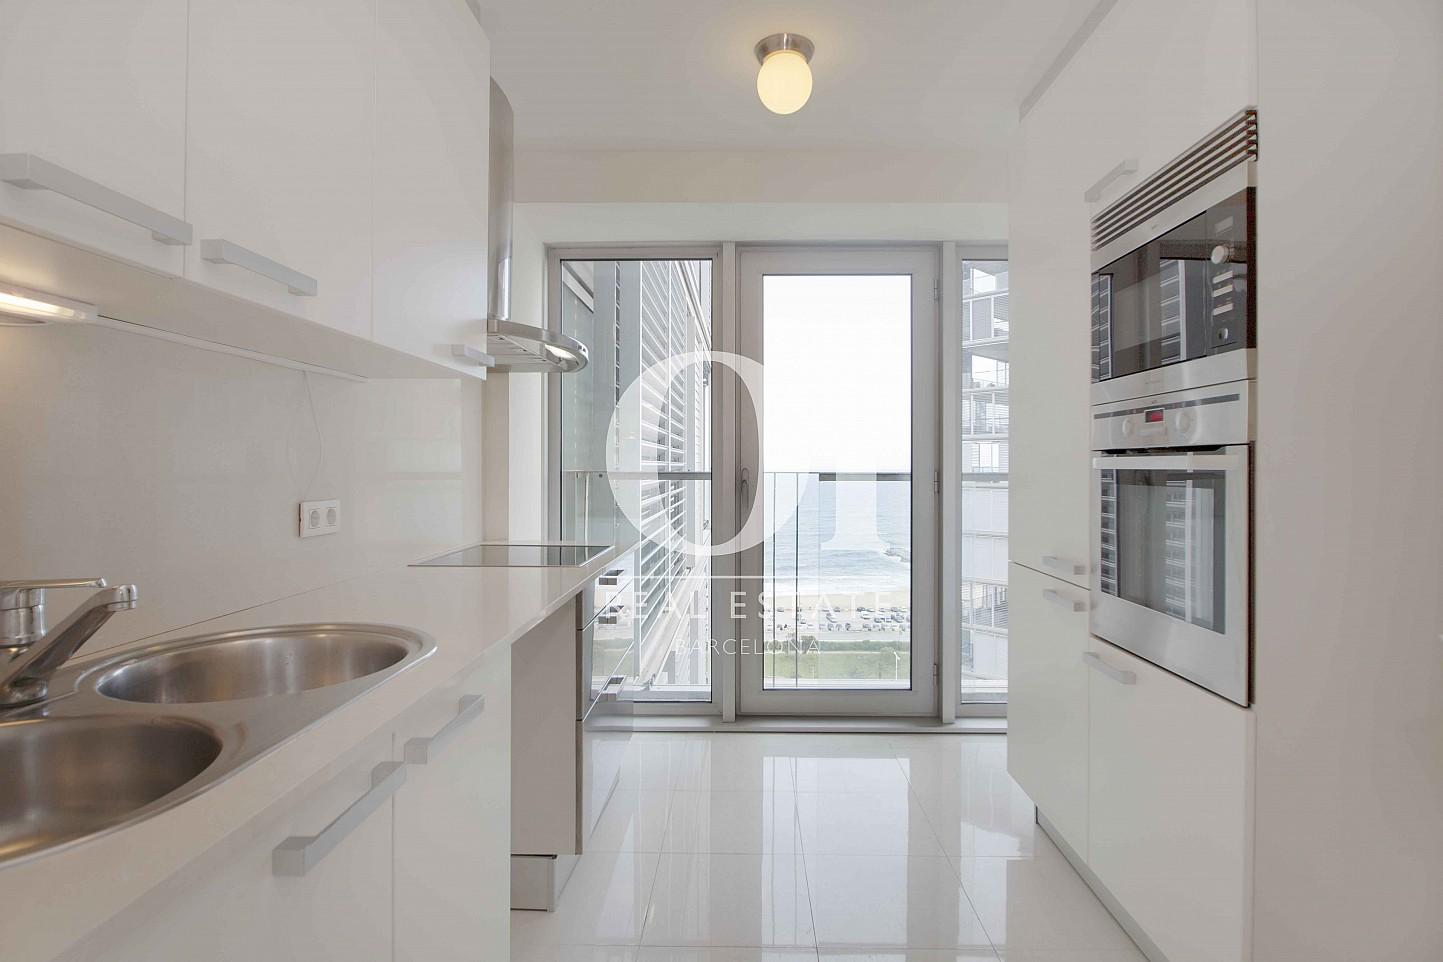 Grand appartement de luxe en vente diagonal mar - Appartement vente barcelone ...